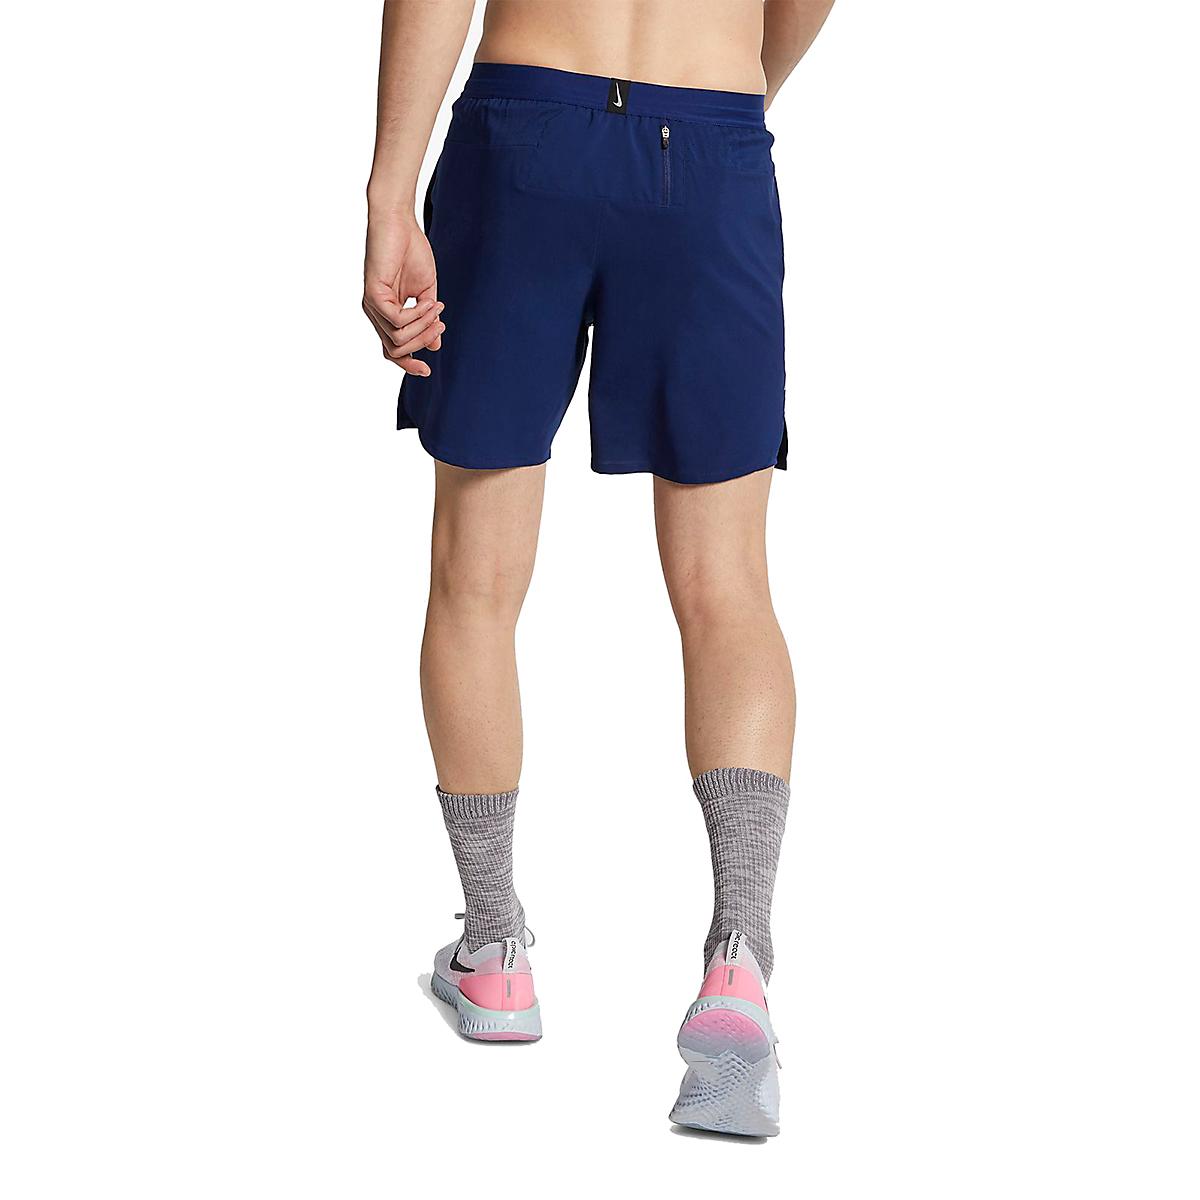 Men's Nike Dri-FIT Flex Stride 7 Inch 2-in-1 Short - Color: Blue Void/Blue Void/Reflective Silver - Size: S, Blue Void/Blue Void/Reflective Silver, large, image 2